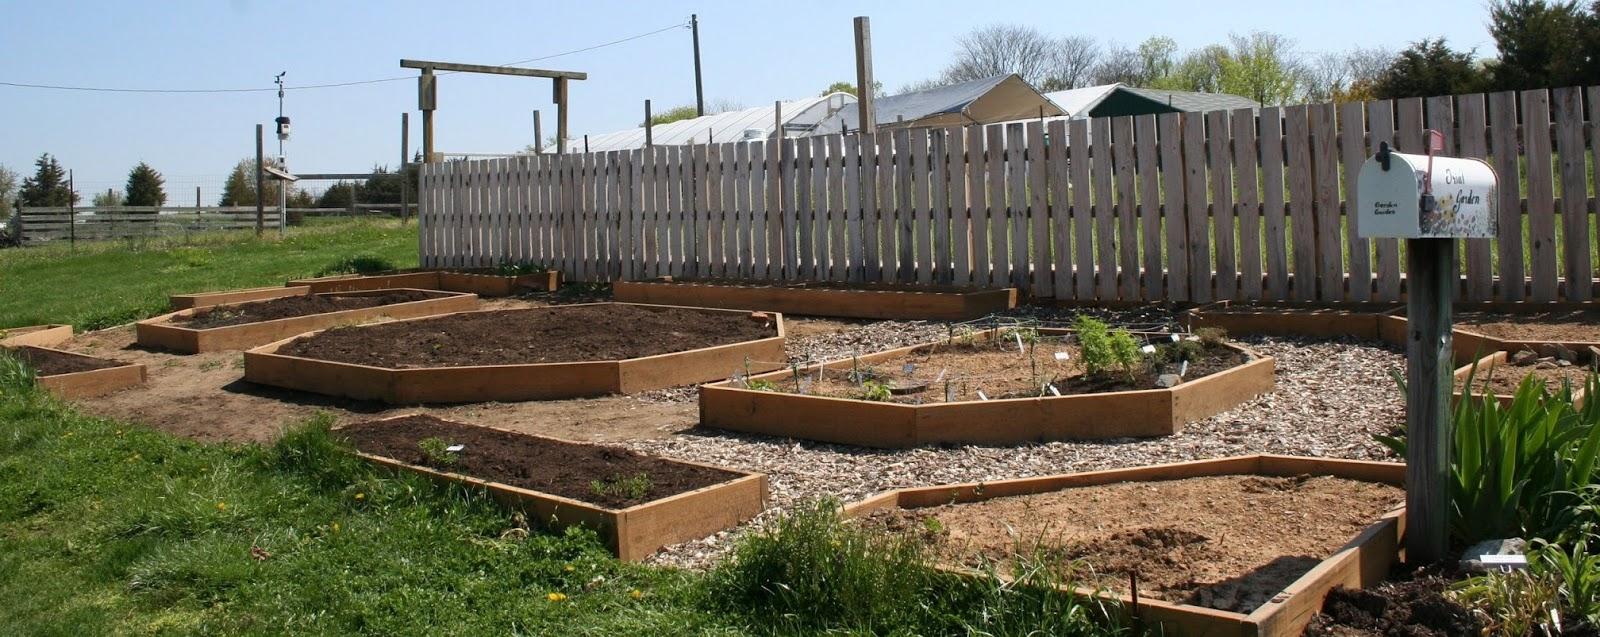 Franklin County (PA) Gardeners: Herb Garden Workday